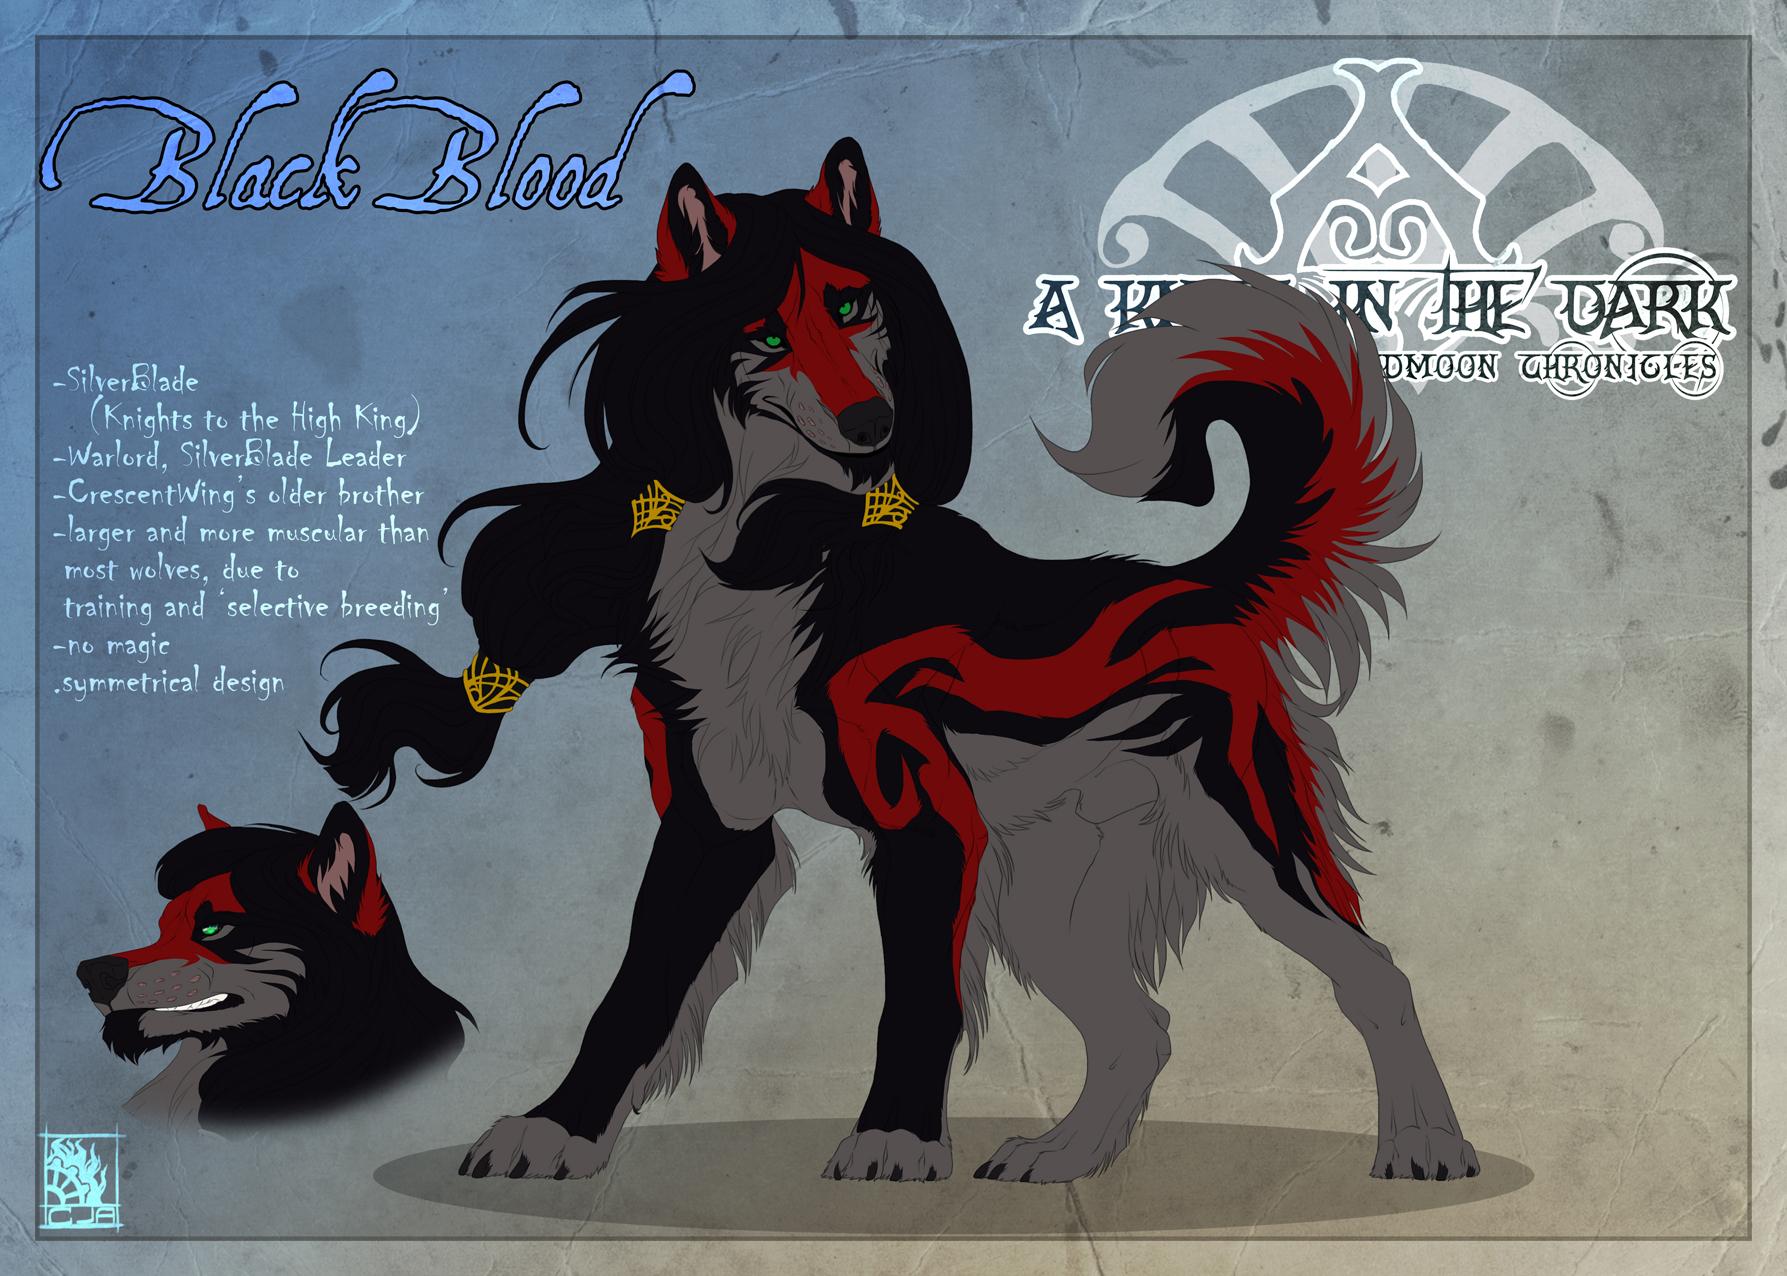 le Grand Chêne Akitd__blackblood_ref_by_t0xiceye-d7zfch8